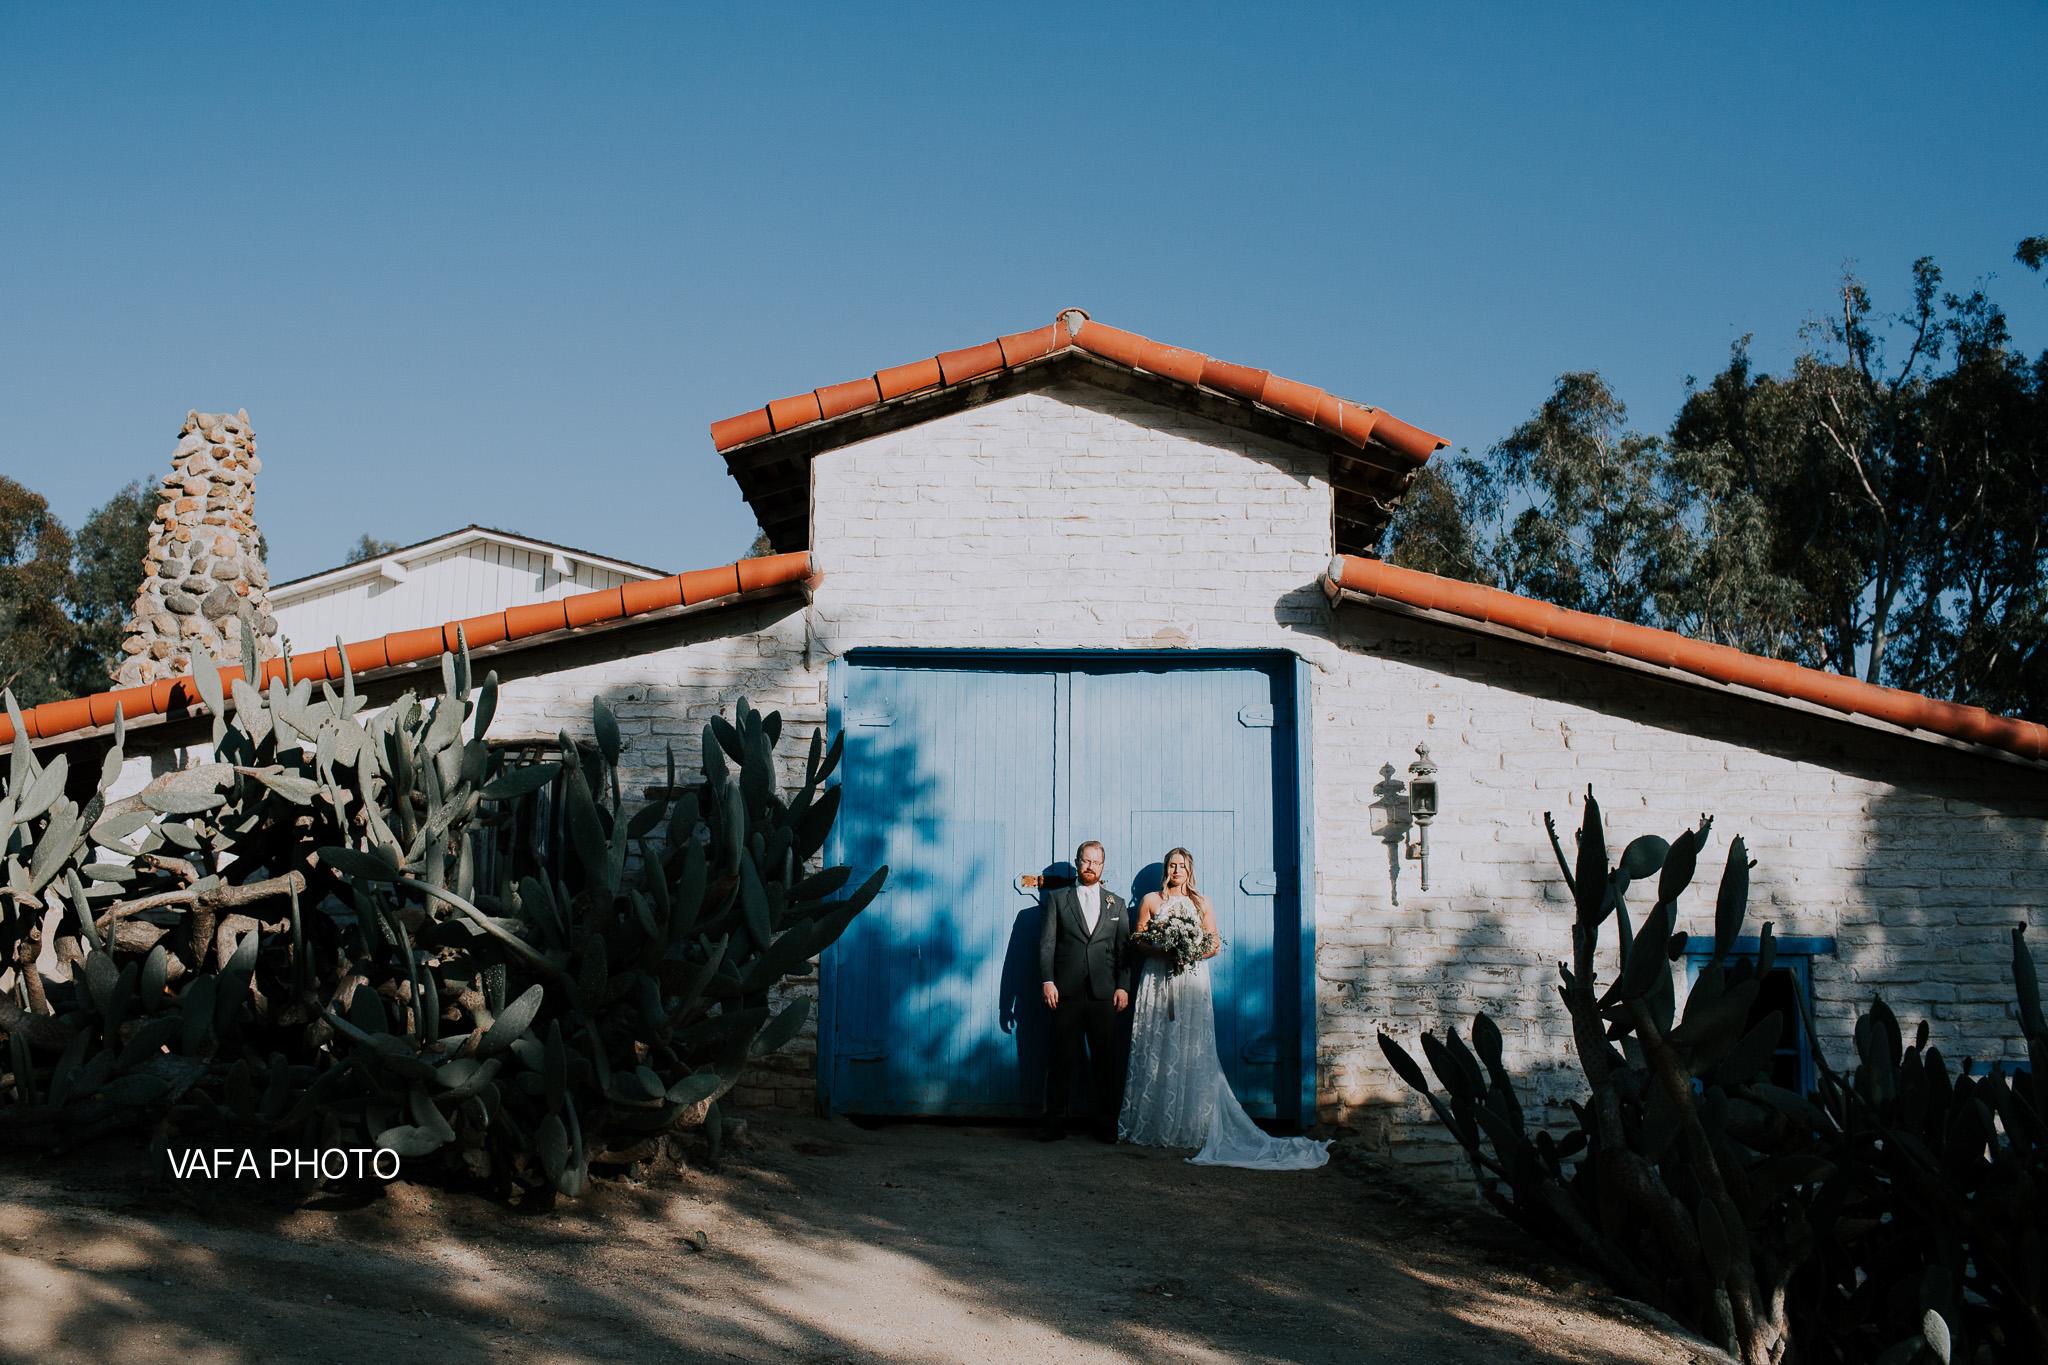 Leo-Carrillo-Ranch-Wedding-Lauren-Mike-Vafa-Photo-696.jpg